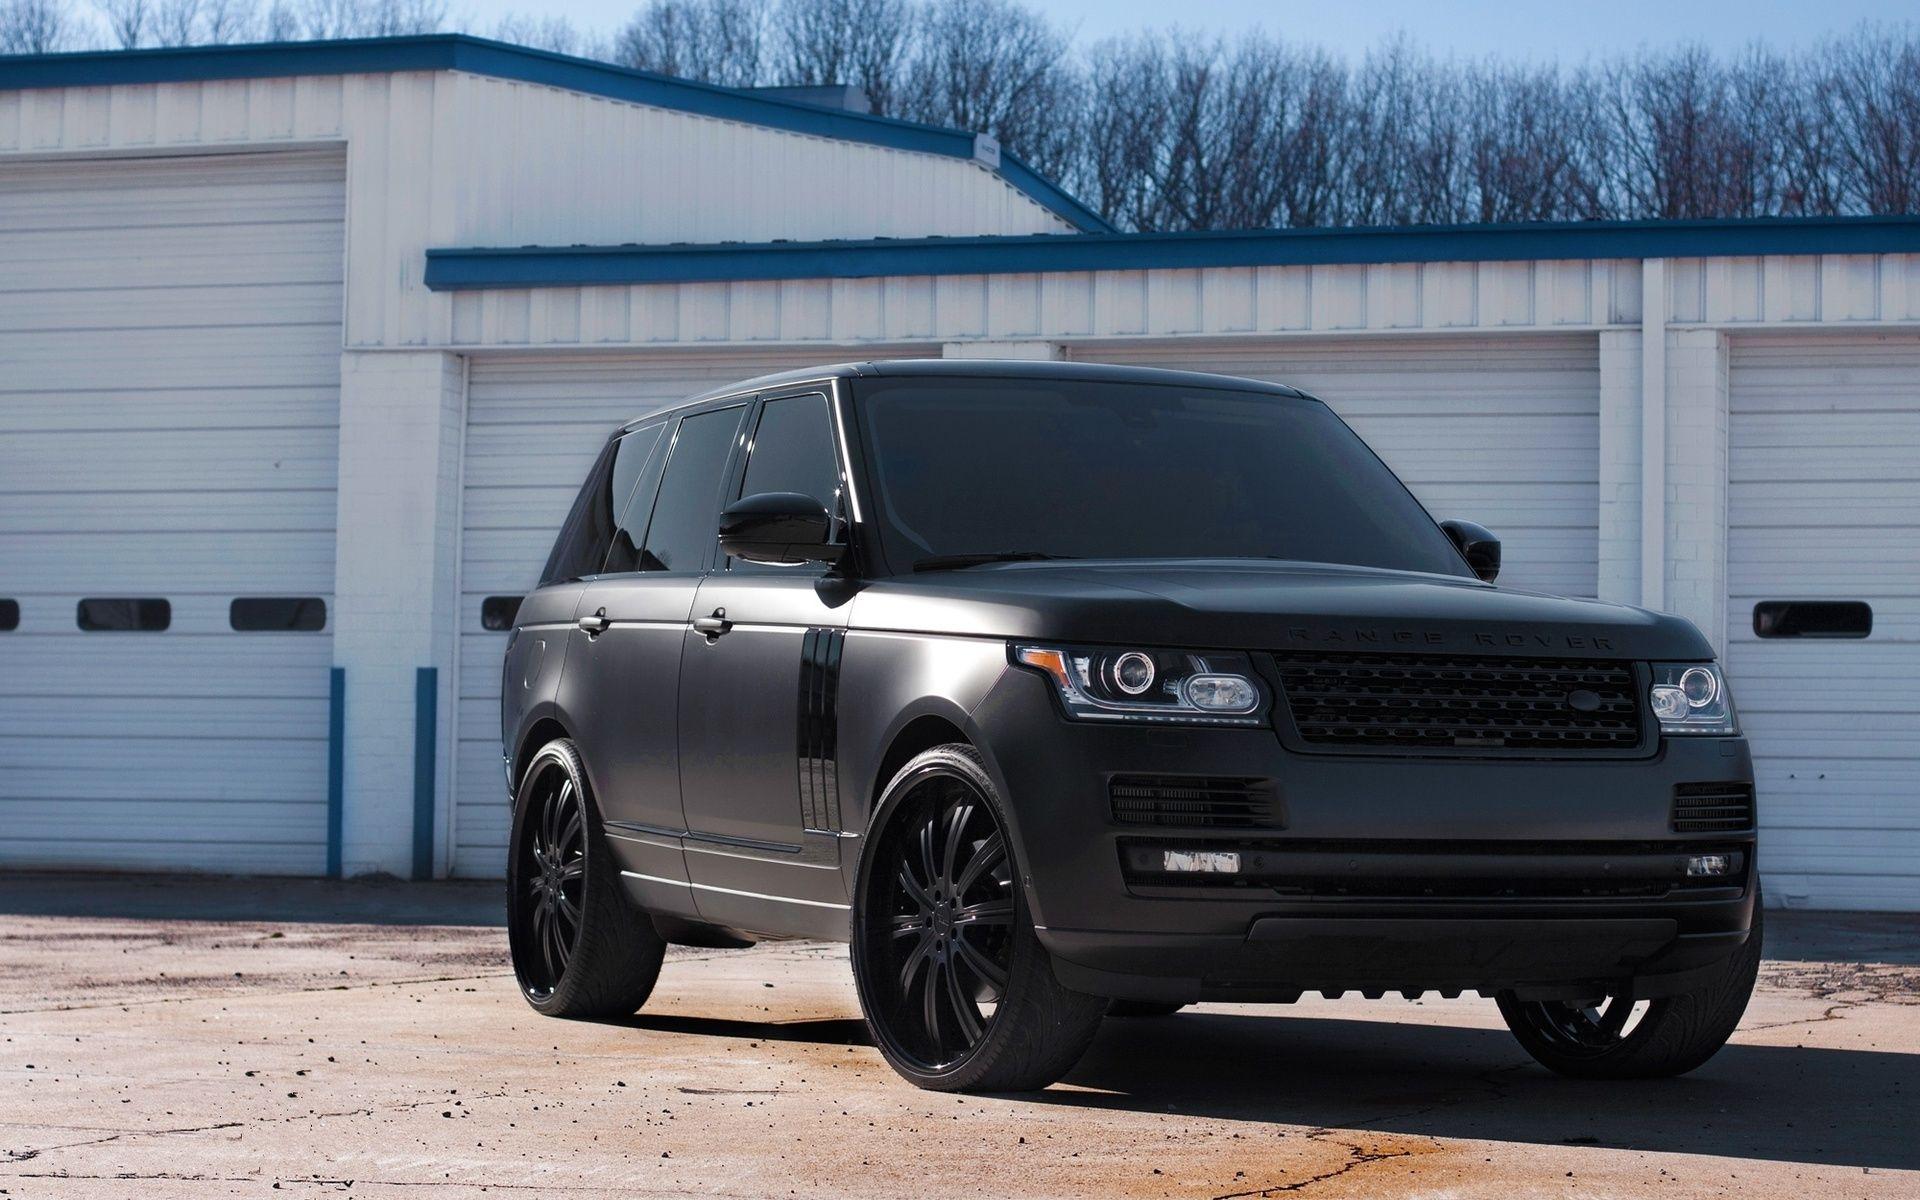 Range Rover Vogue Matte Black Range Rover Dream Cars Land Rover